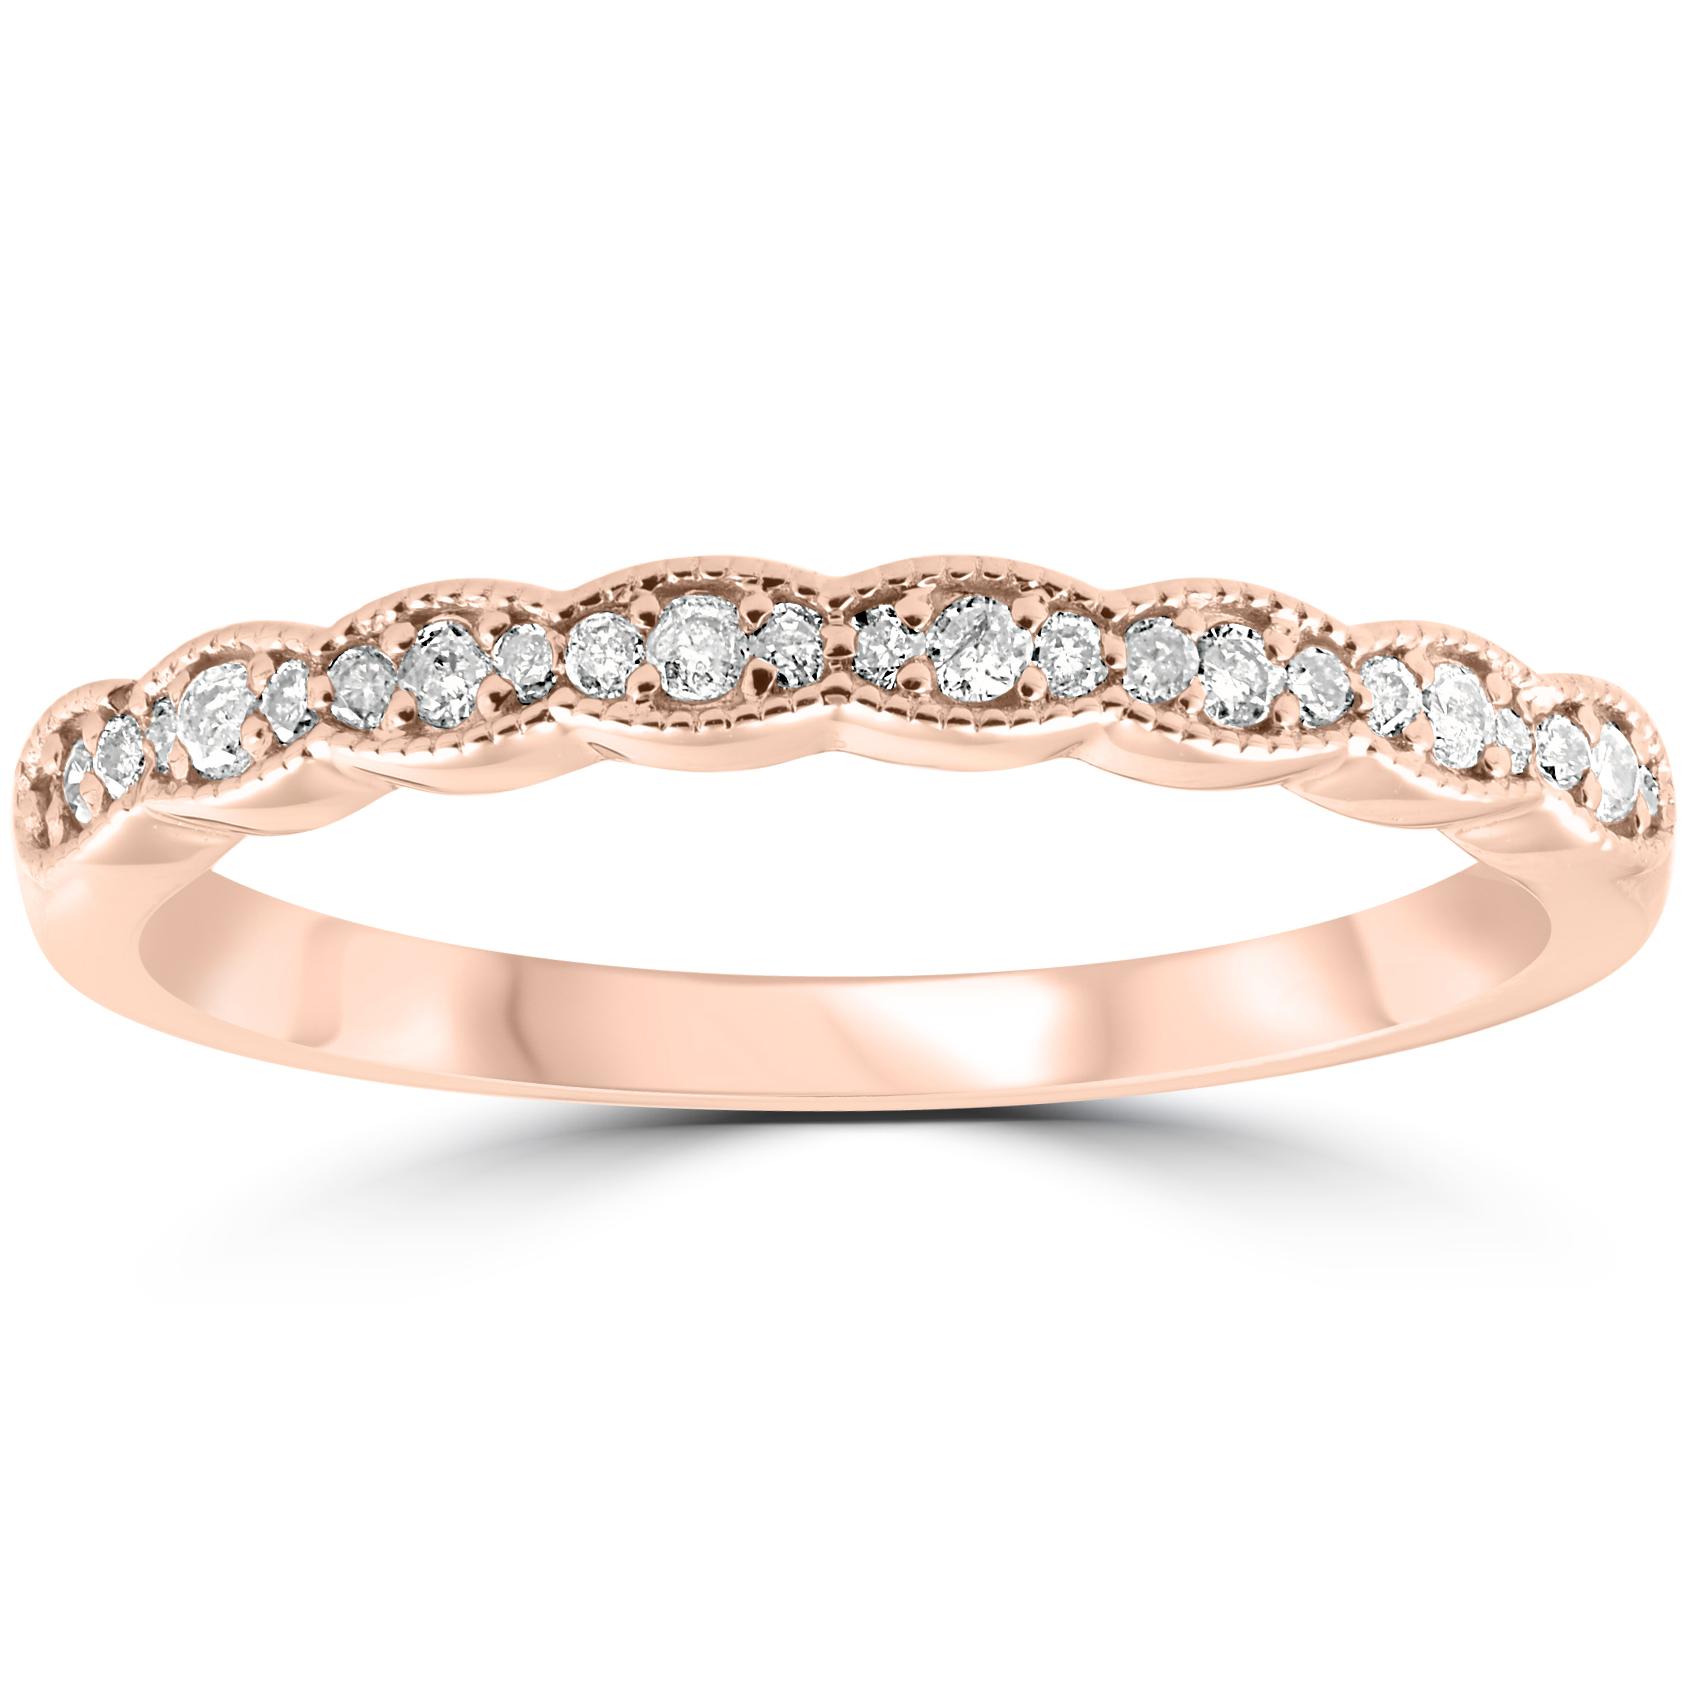 1/5 cttw Diamond Stackable Womens Wedding Ring 14k Rose